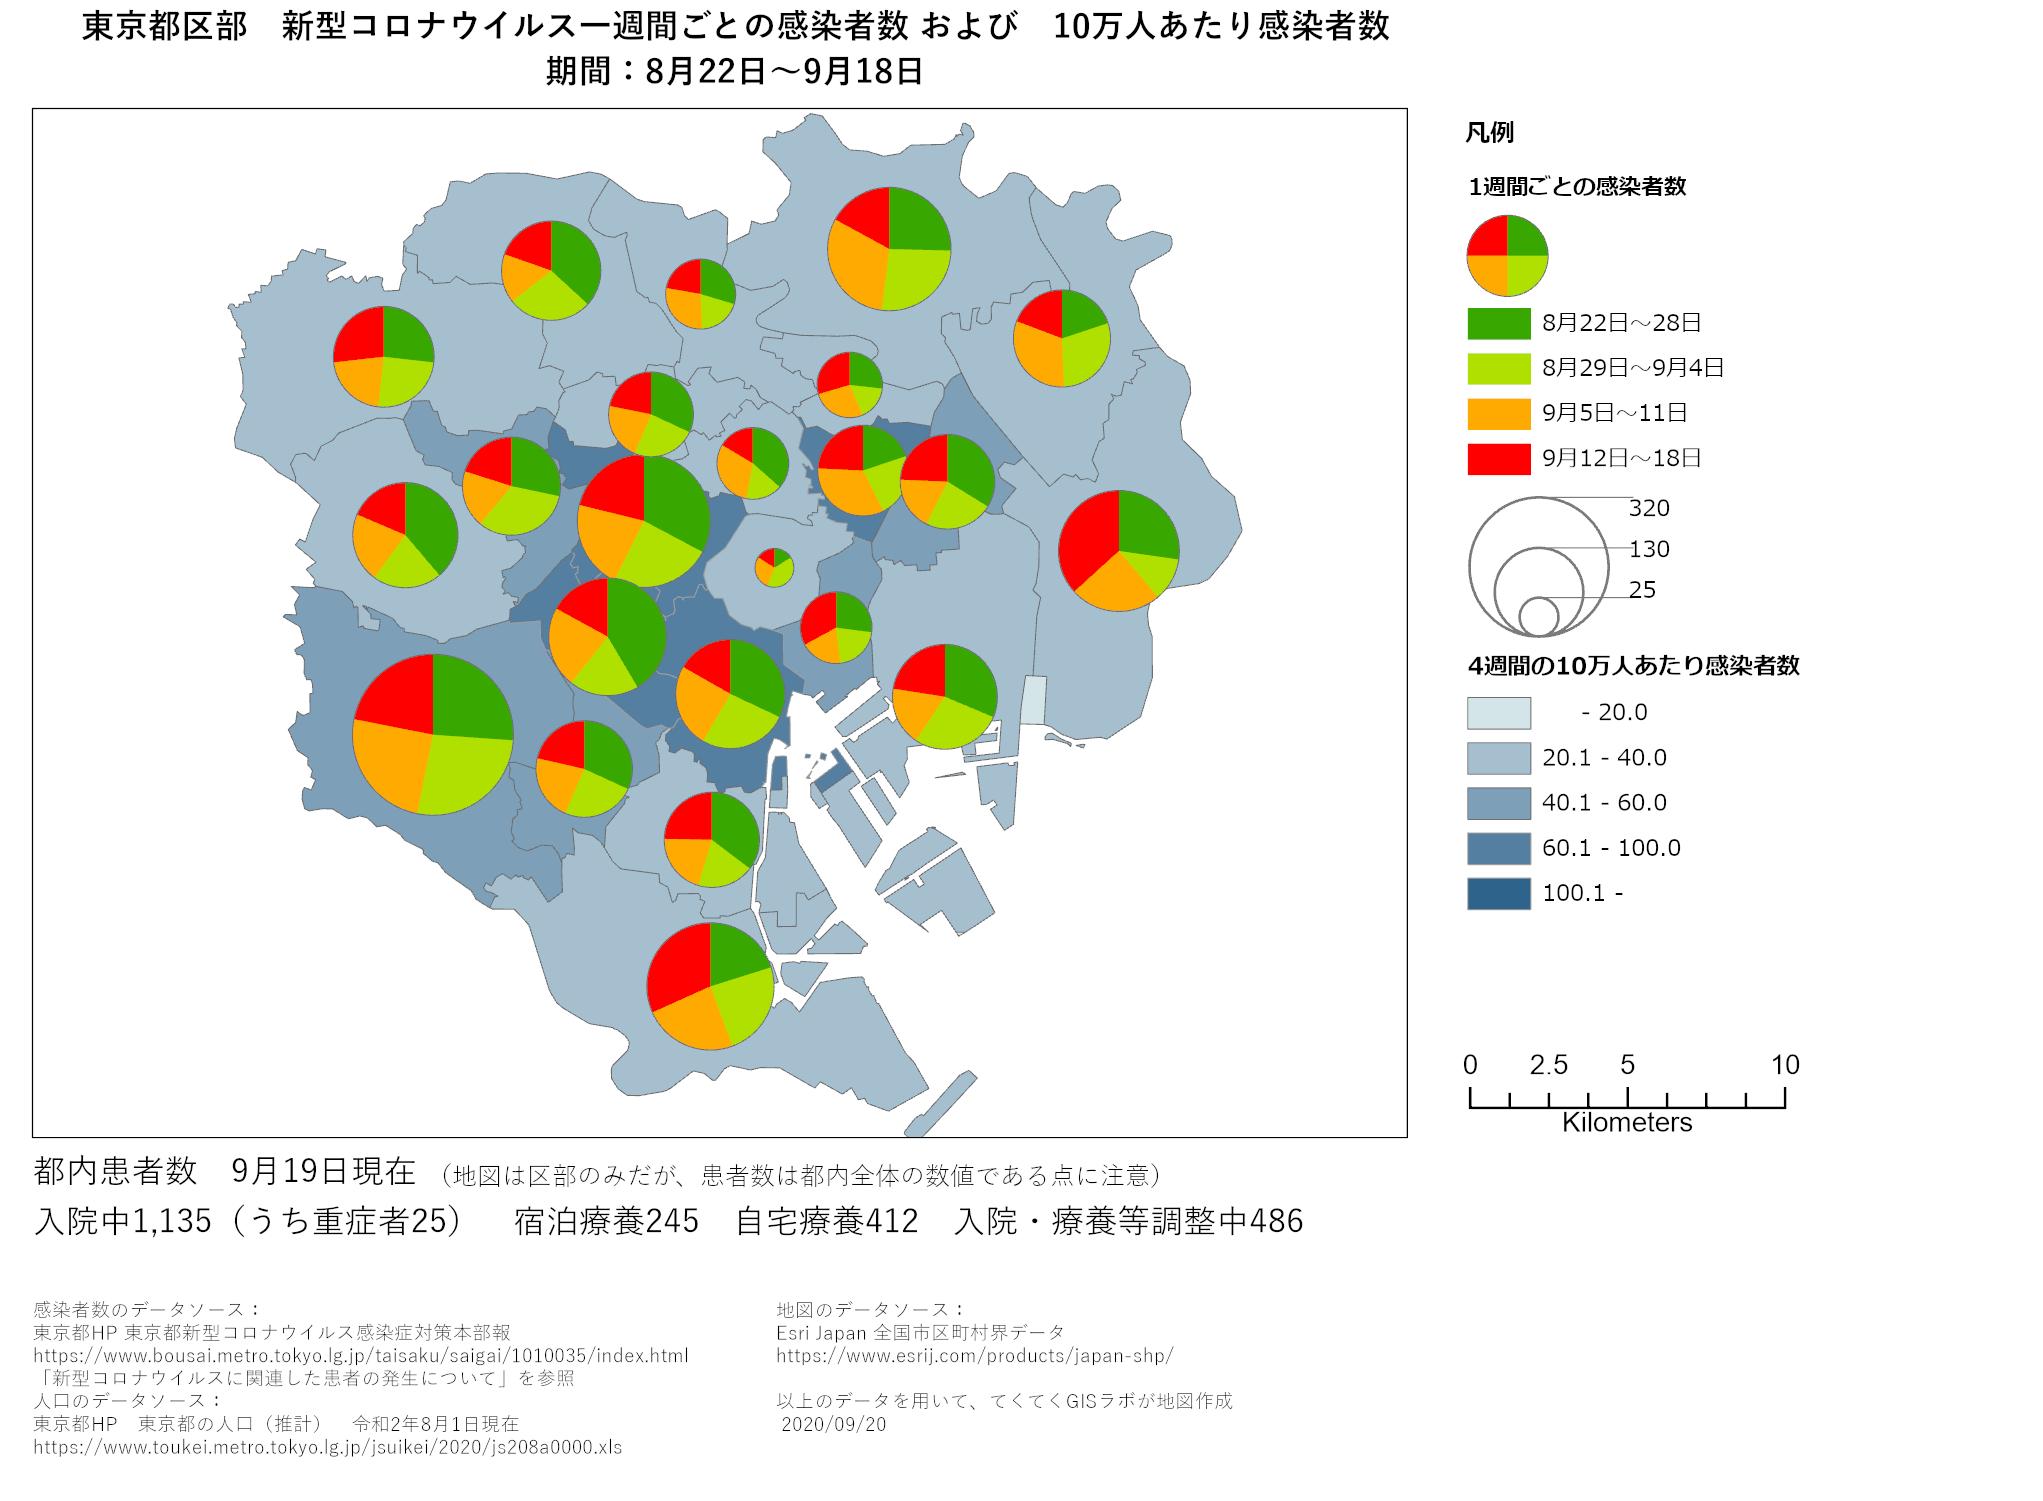 1週間ごと感染者数、東京都、8月22日〜9月18日